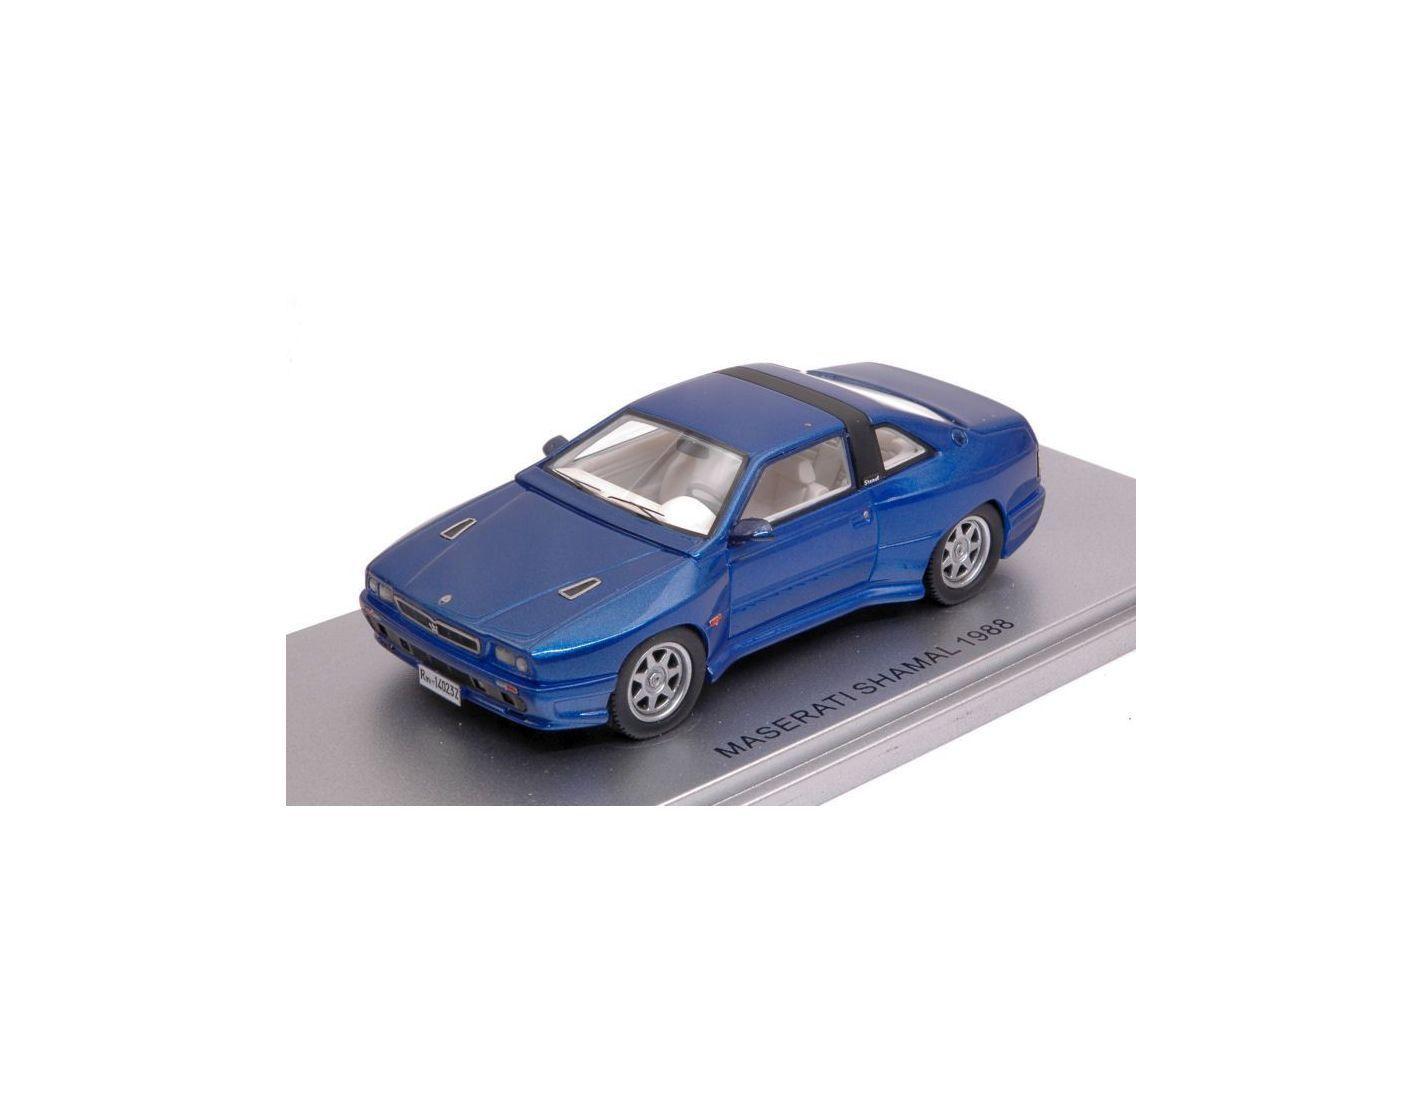 Kess Model KS43014023 MASERATI SHAMAL 1988 METALLIC blu ED.LIM.PCS 250 1 43 Mod